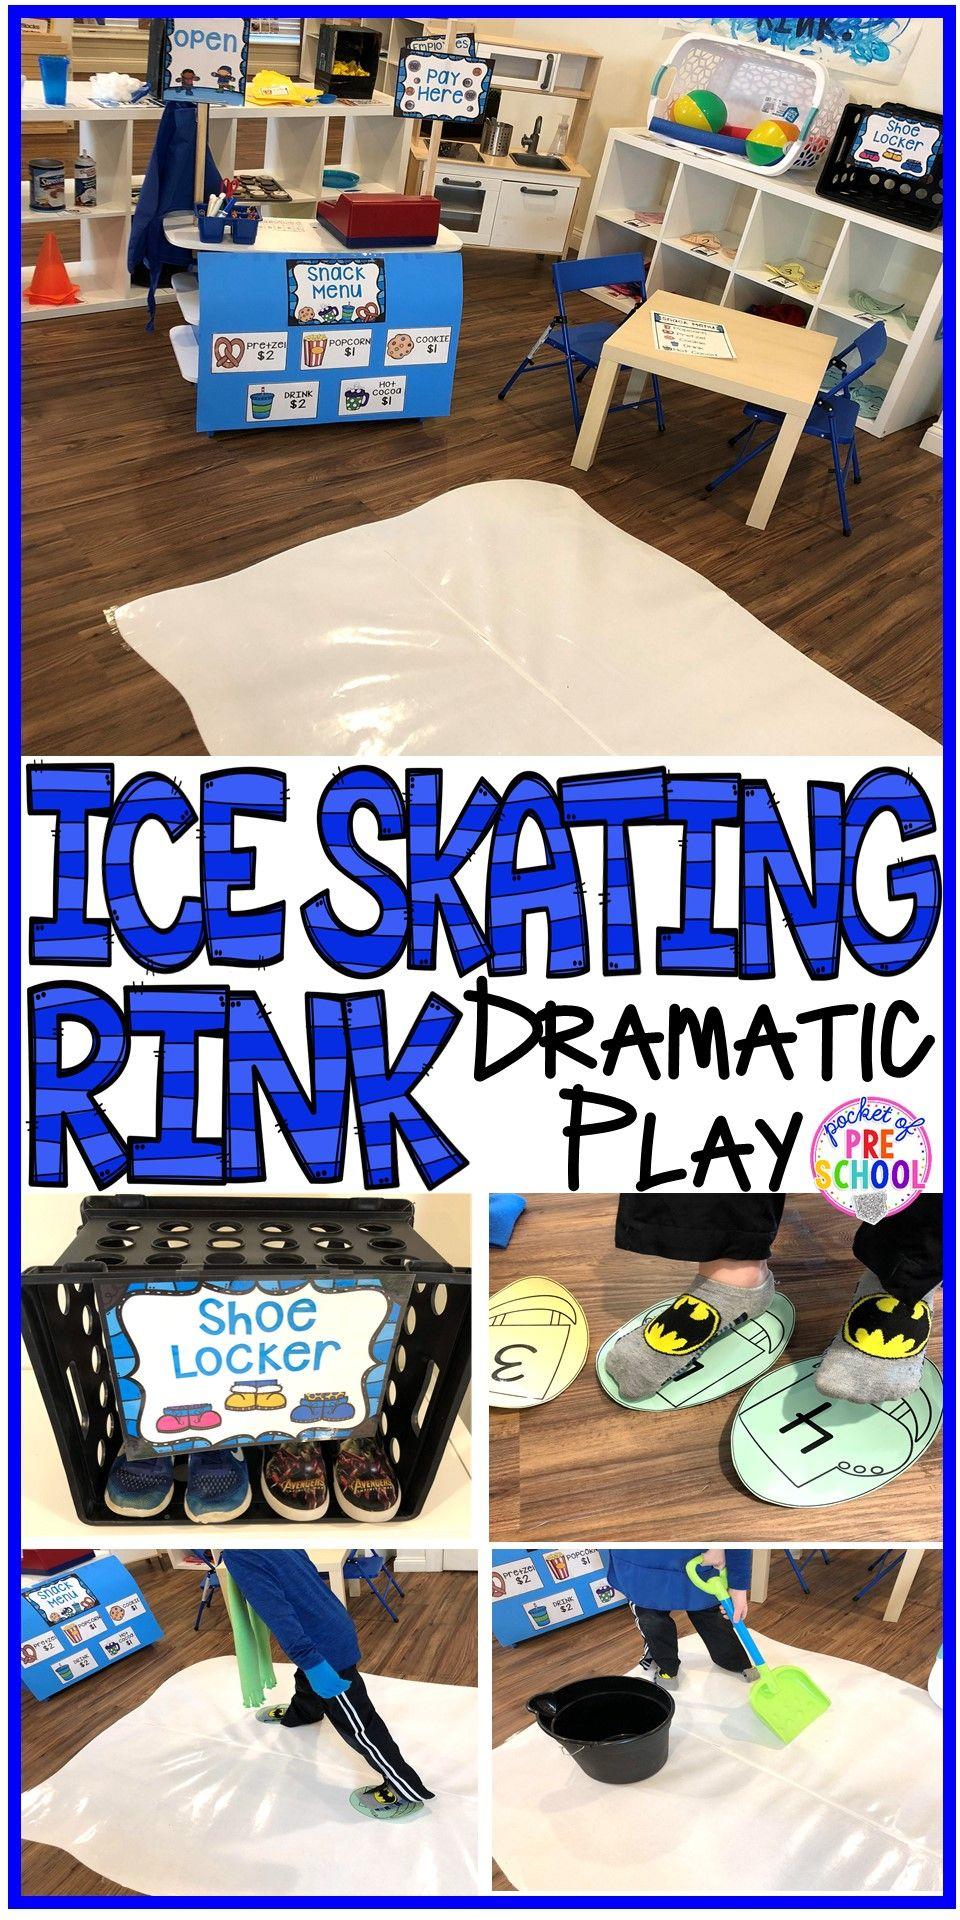 Ice rink dramatic play for preschool prek